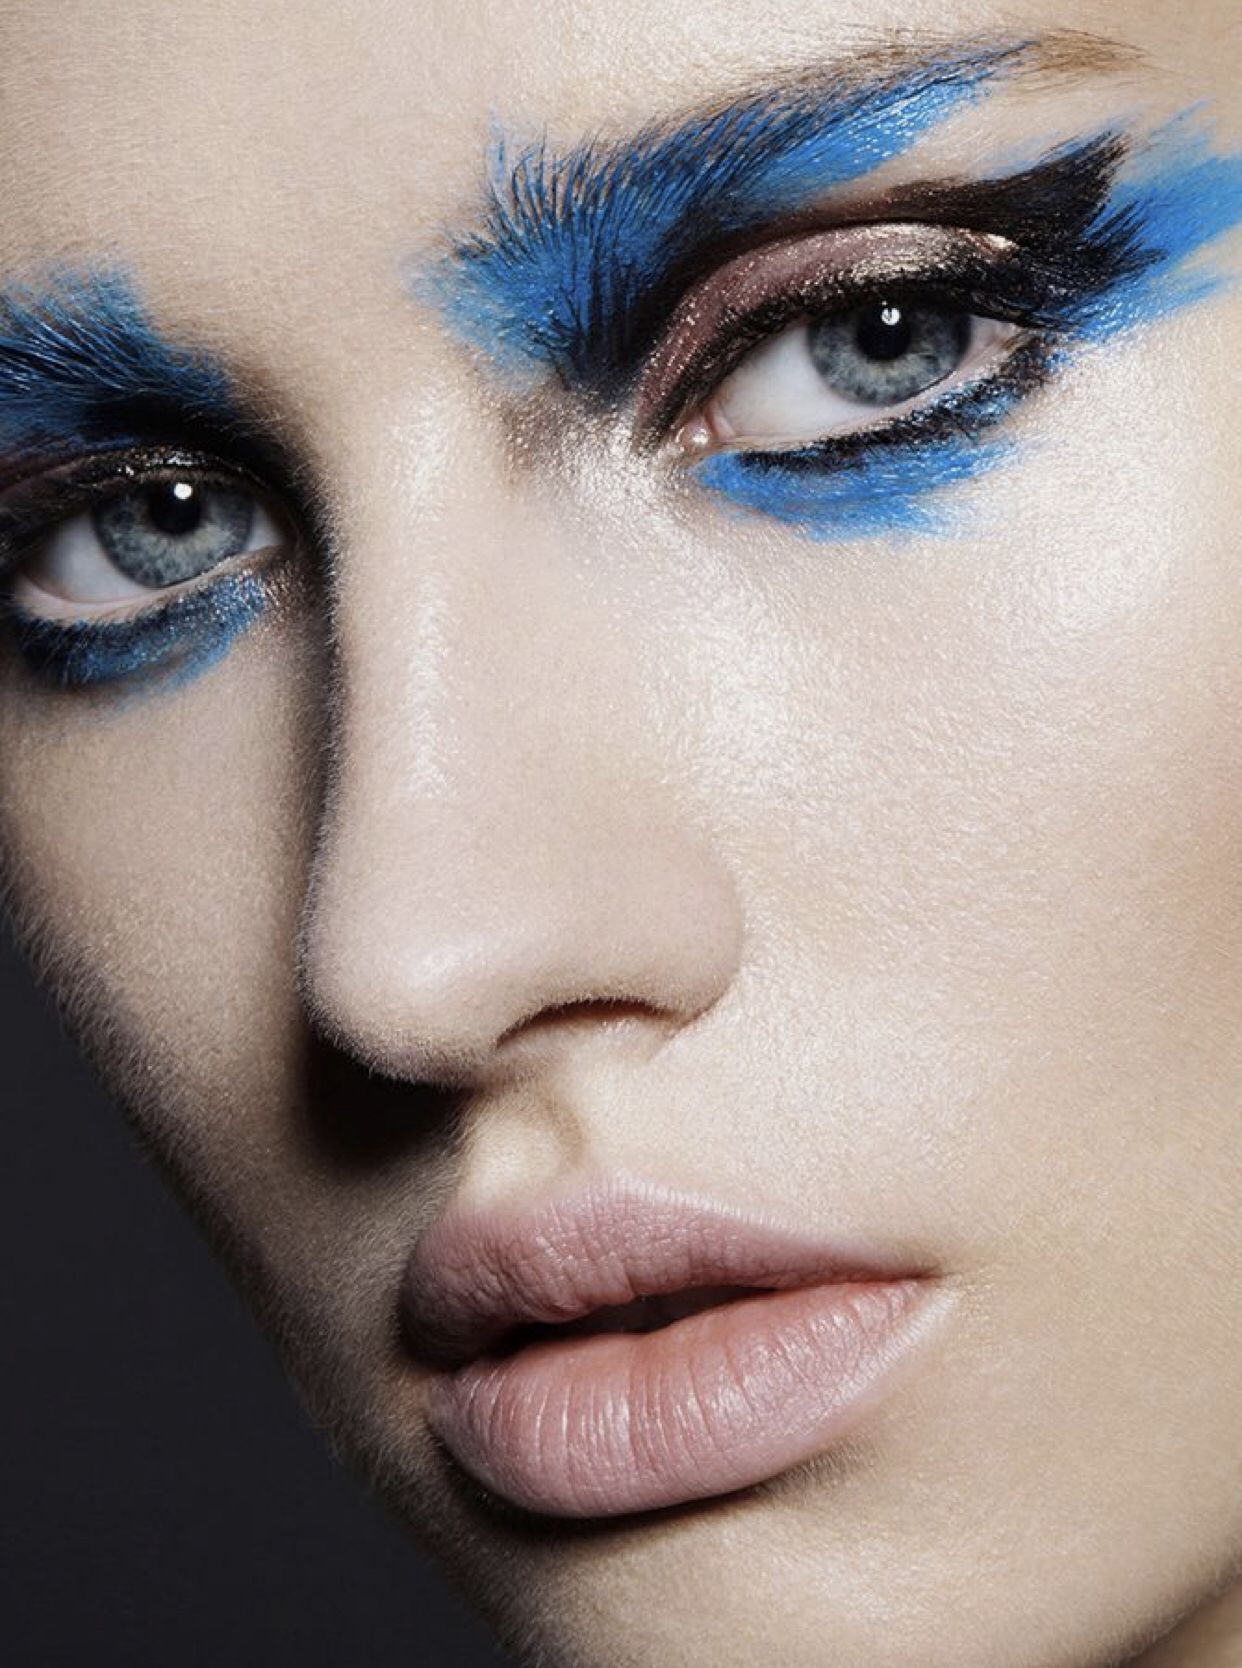 High Fashion Makeup In 2020 High Fashion Makeup Editorial Fashion Editorial Makeup Artistry Makeup